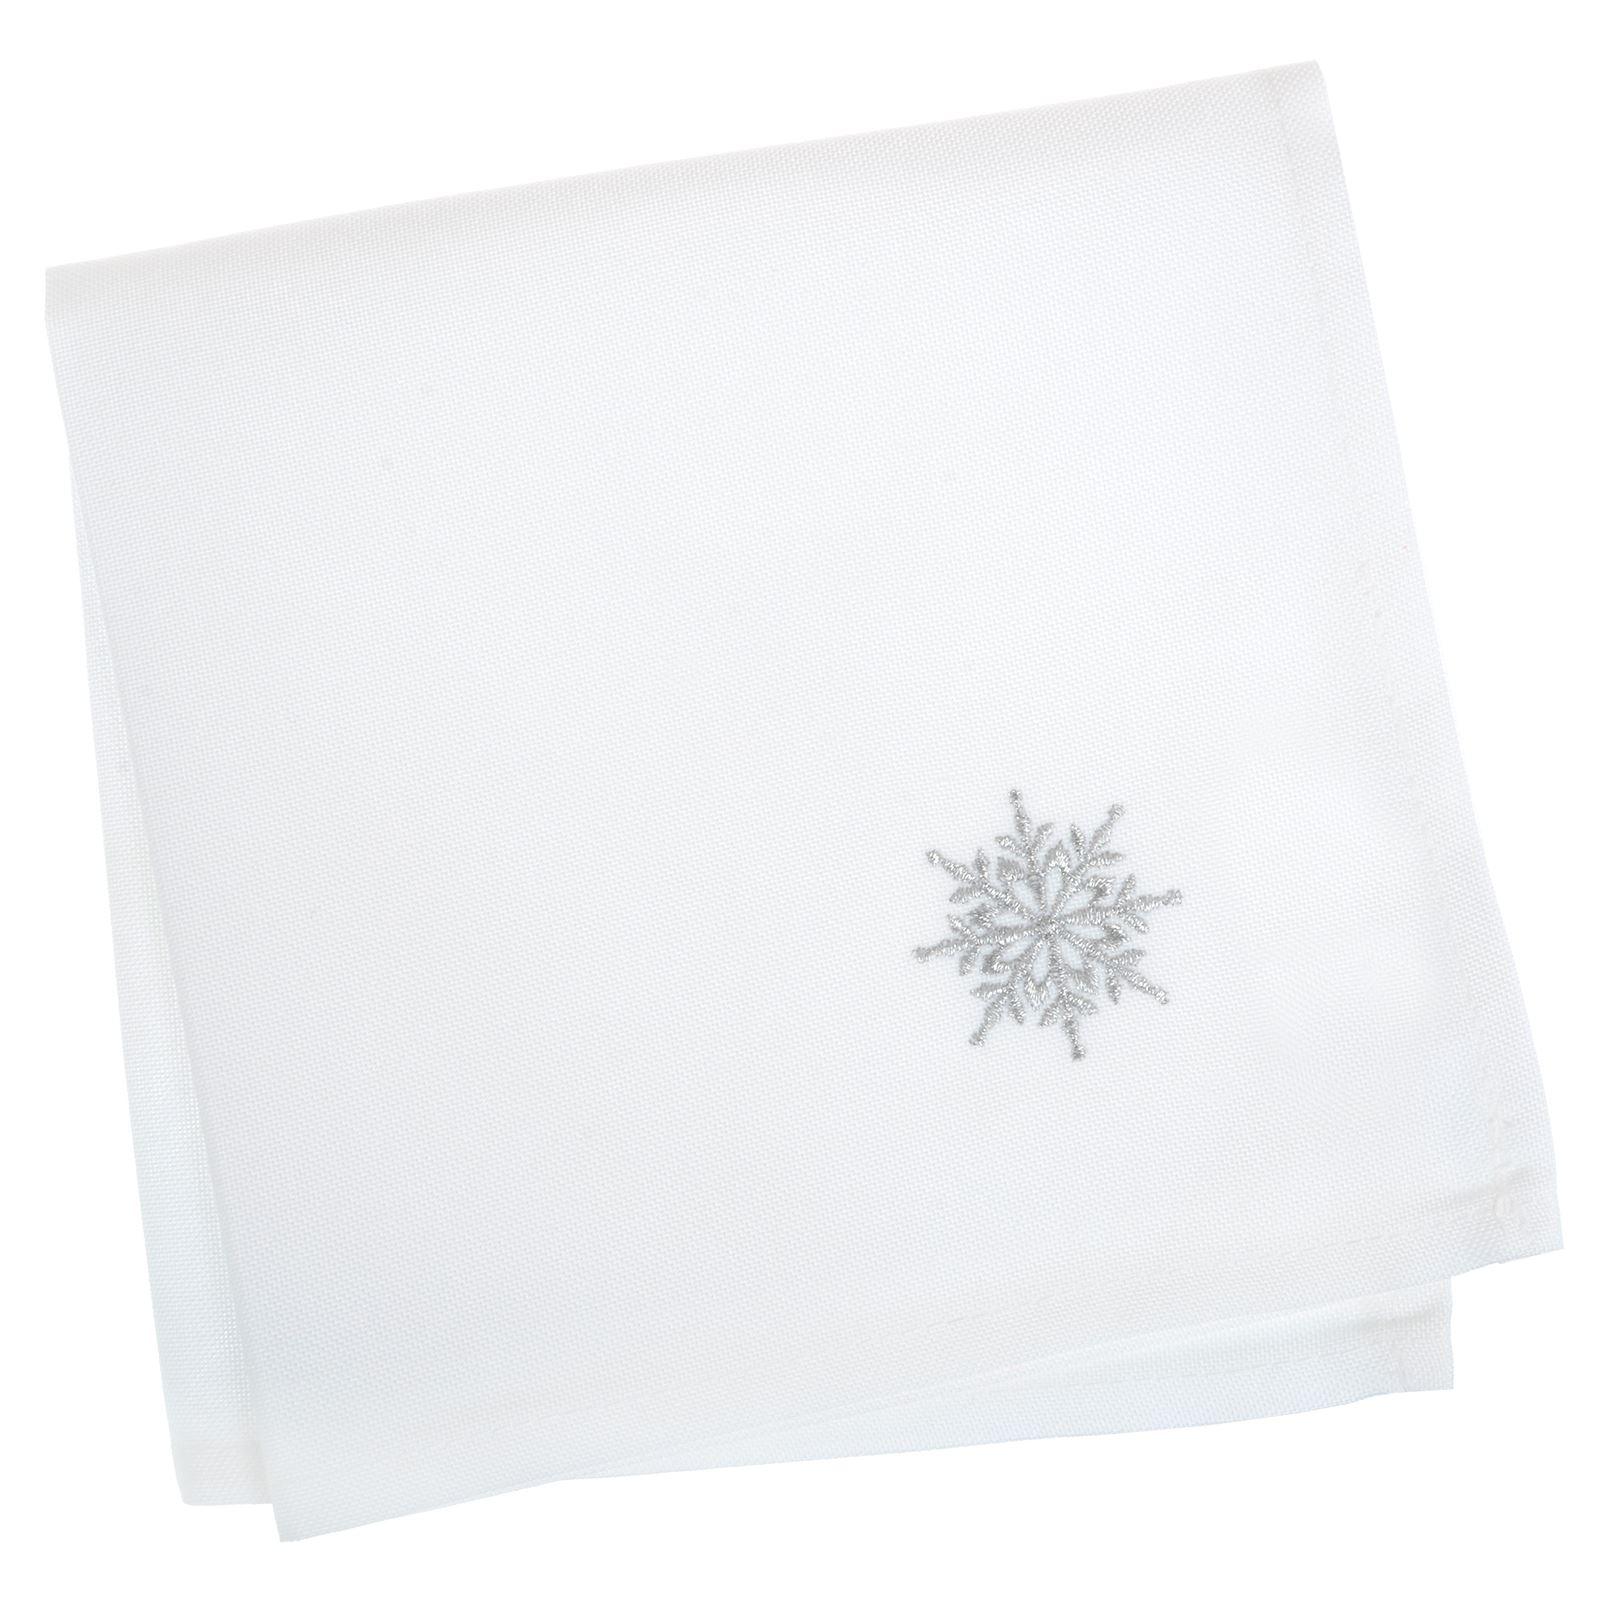 Christmas-Tablecloth-Festive-Pattern-Rectangle-Round-Fabric-Xmas-Room-Decoration Indexbild 34